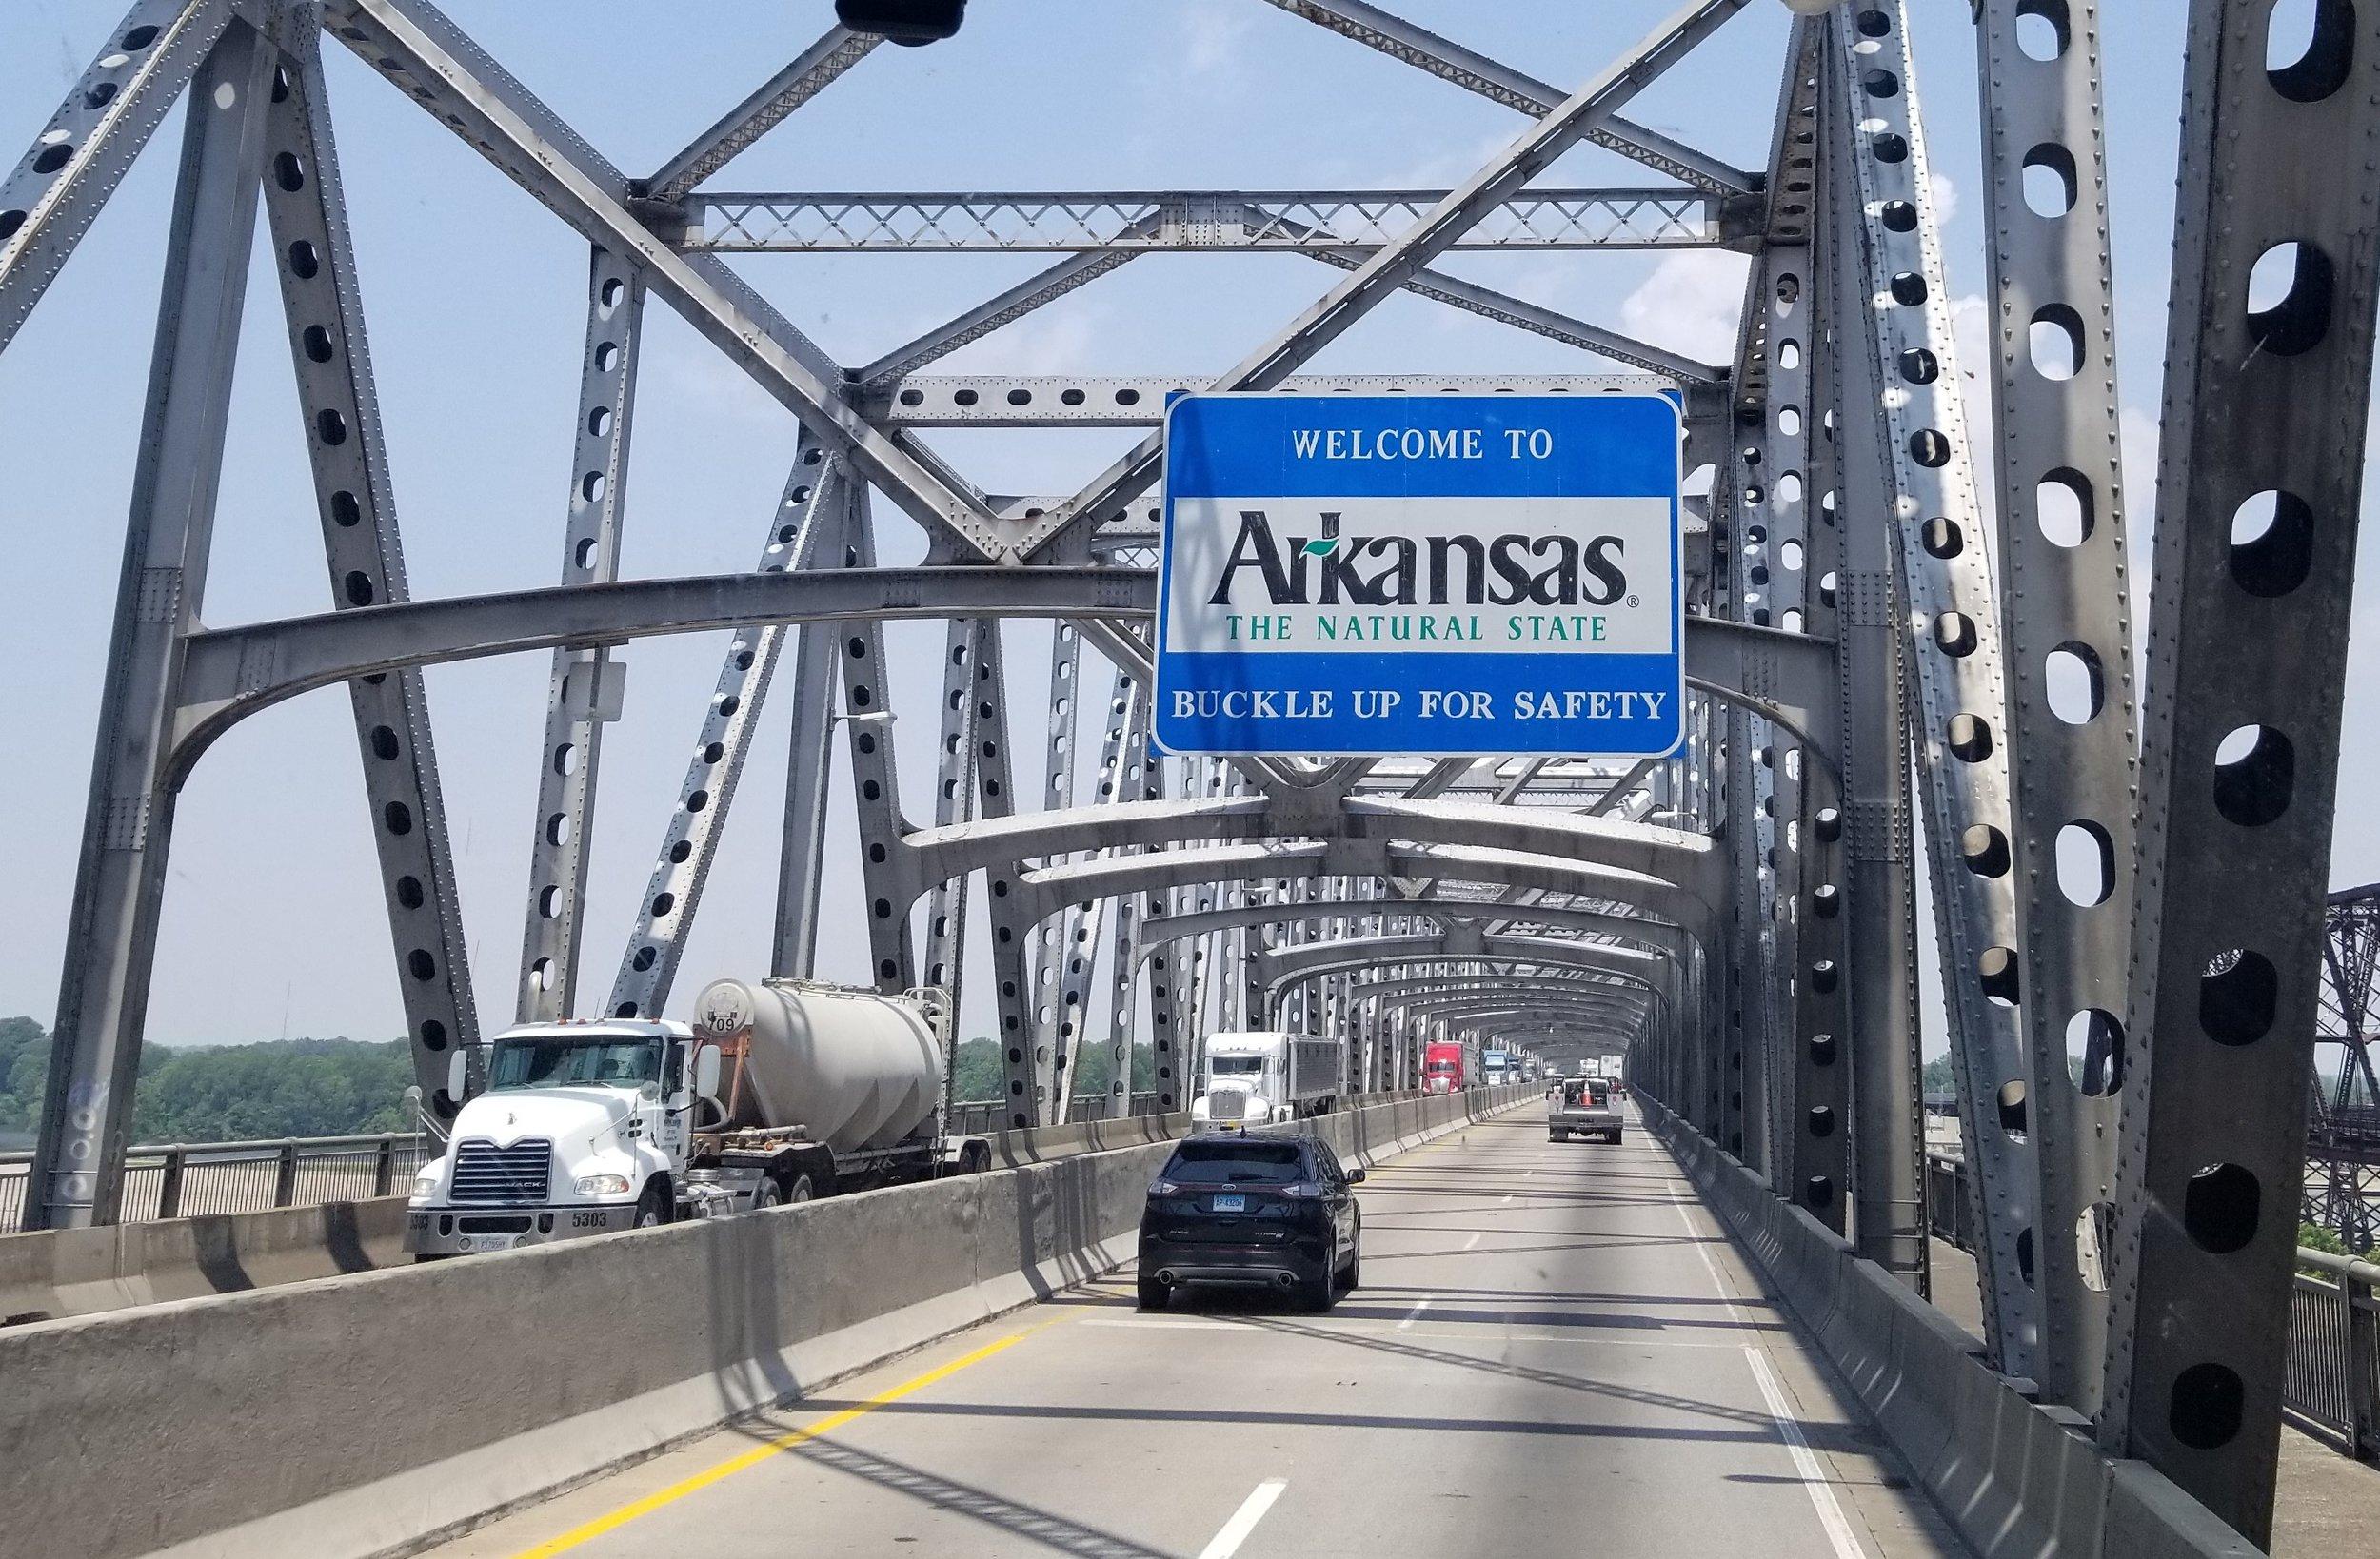 Driving into Arkansas